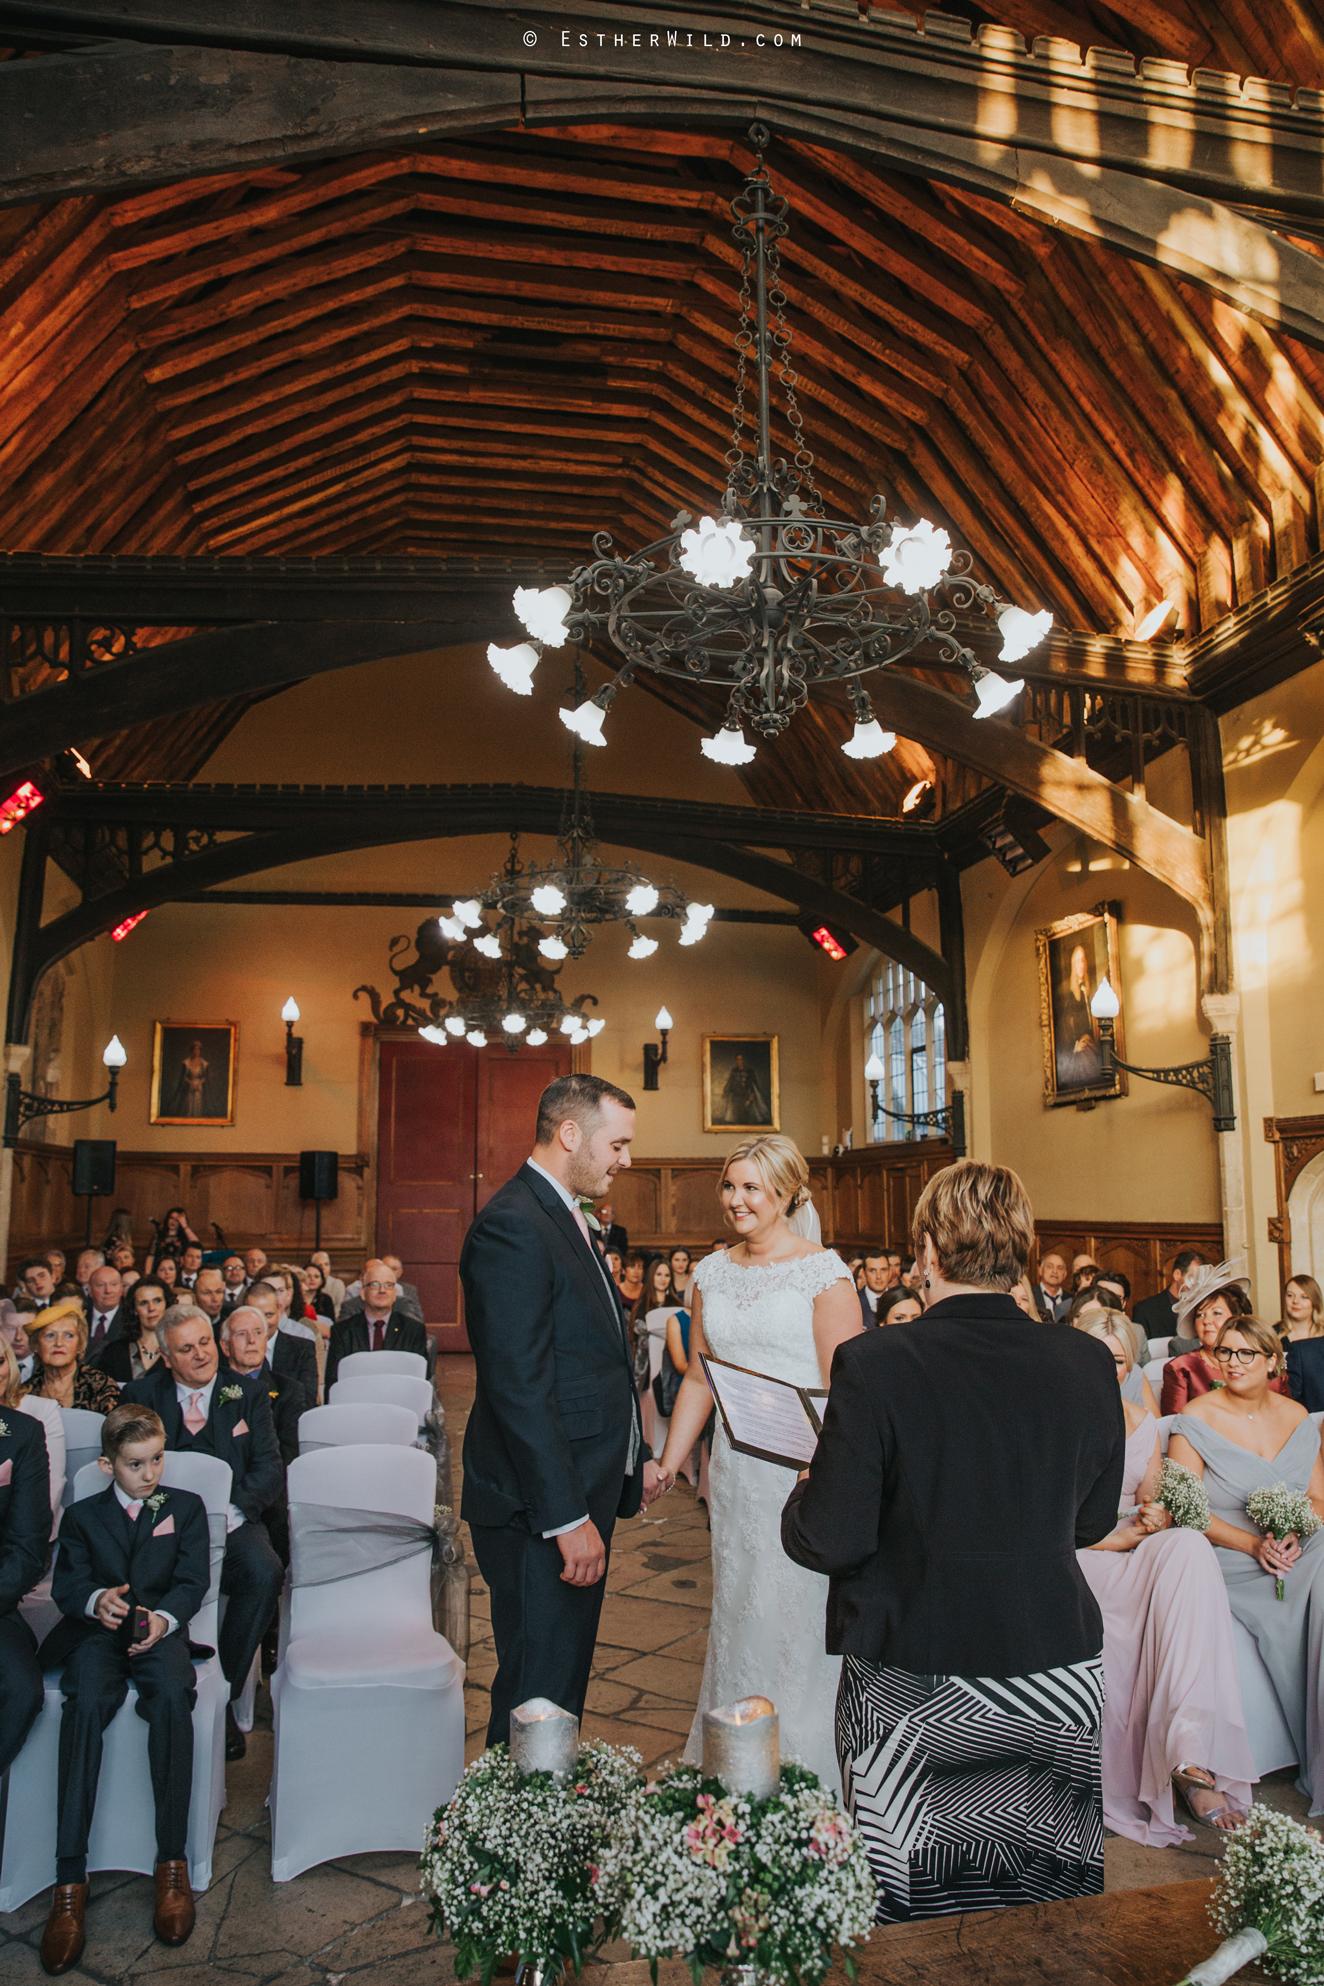 Wedding_Kings_Lynn_Town_Hall_Norfolk_Photographer_Esther_Wild_IMG_0973.jpg